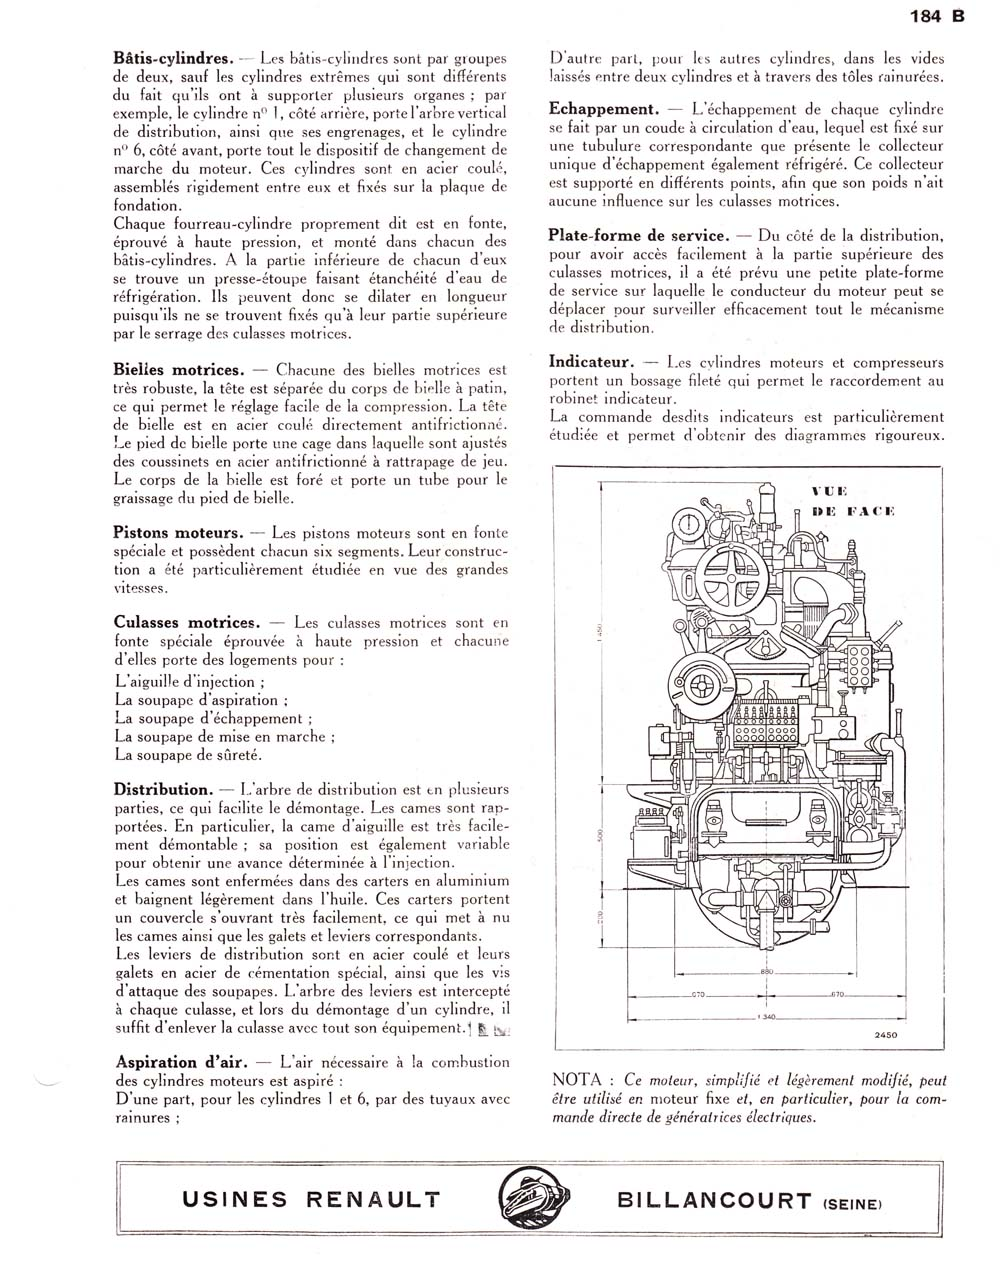 moteur_disel_300cv_marine_5